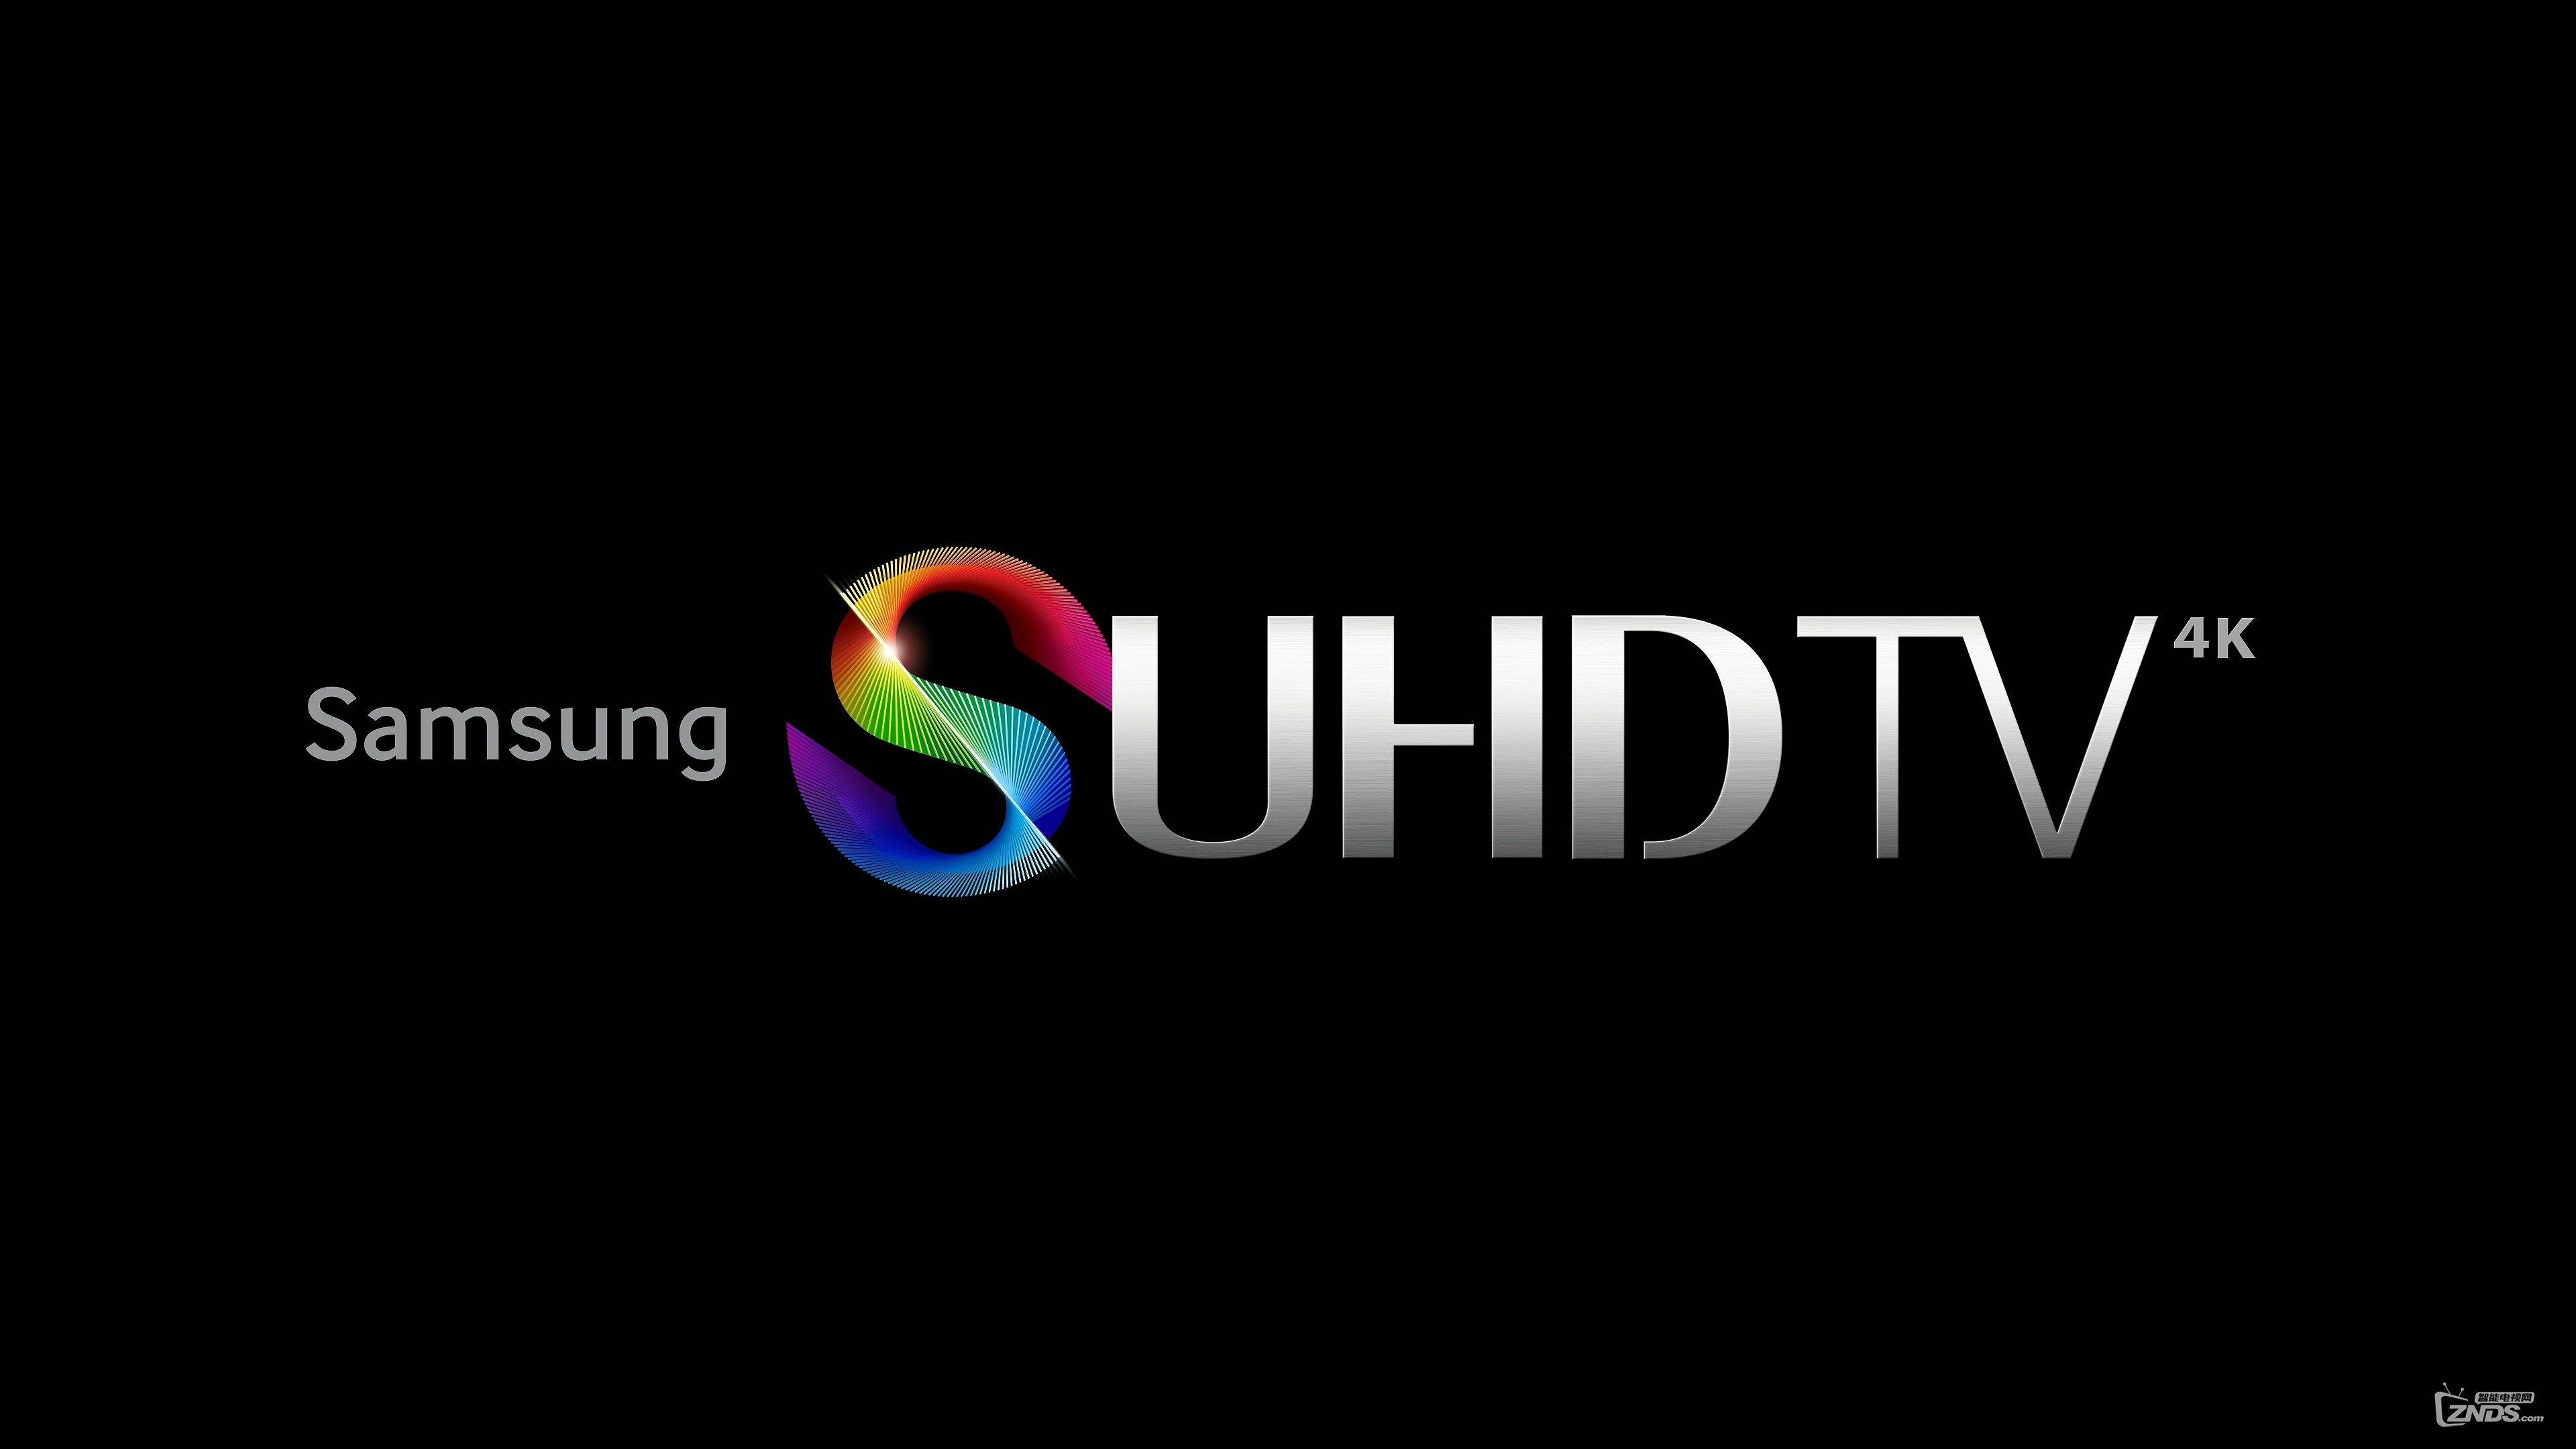 Samsung.SUHDTV_Sensational.Picture.ts_20160923_203749.014.jpg